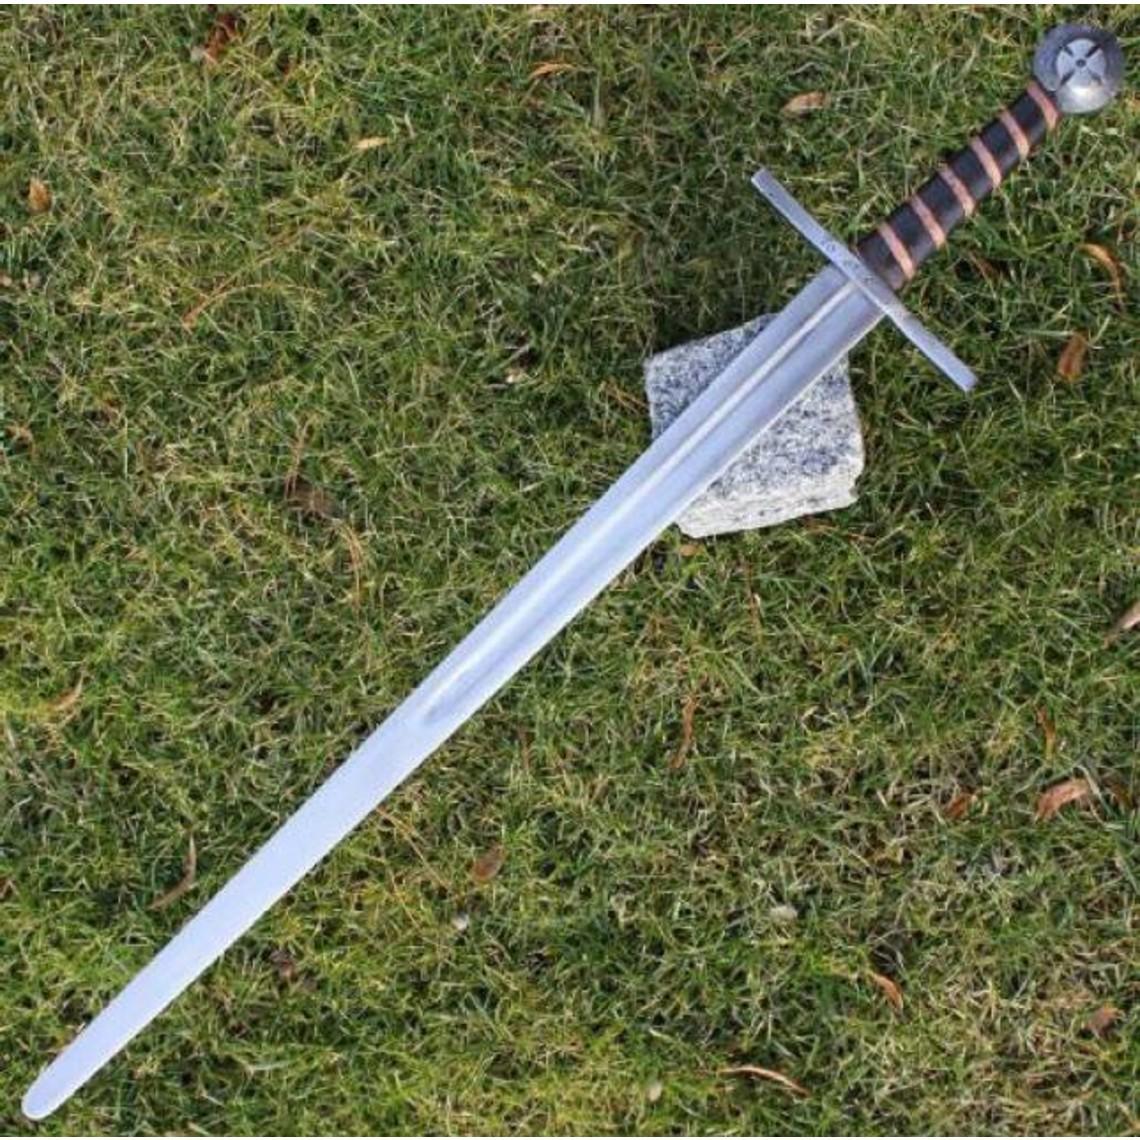 kovex ars Espada corta de arquero